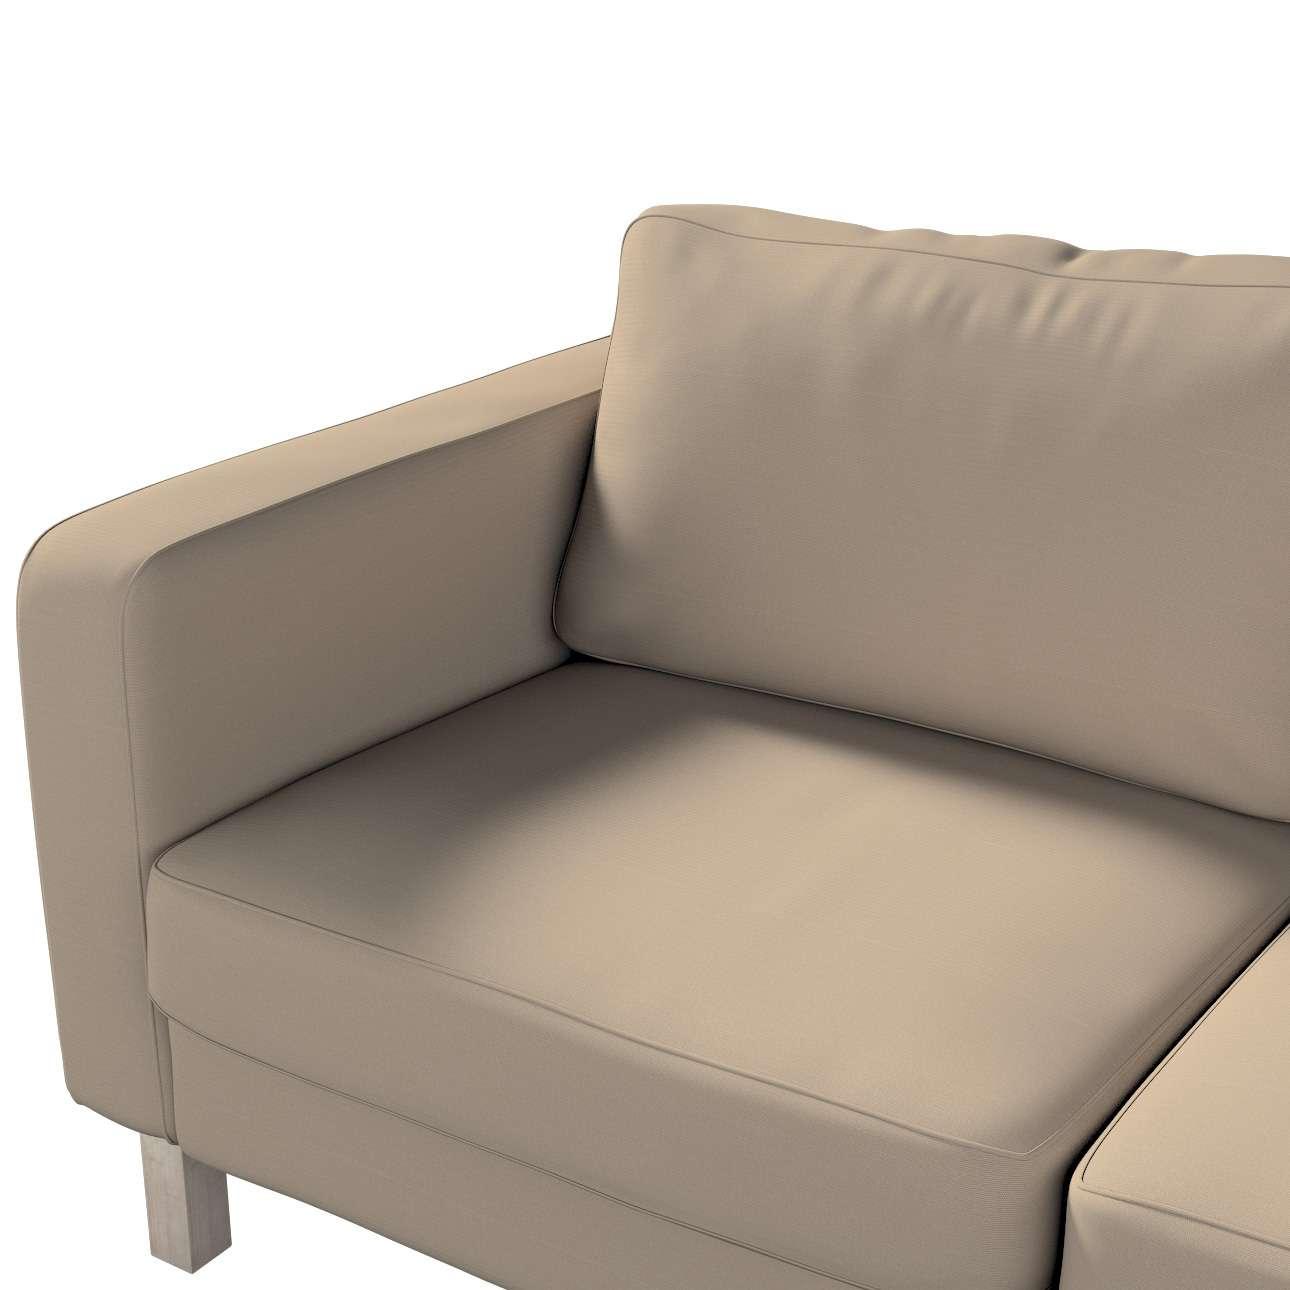 Karlstad klädsel 2-sits soffa - kort i kollektionen Panama Cotton, Tyg: 702-28